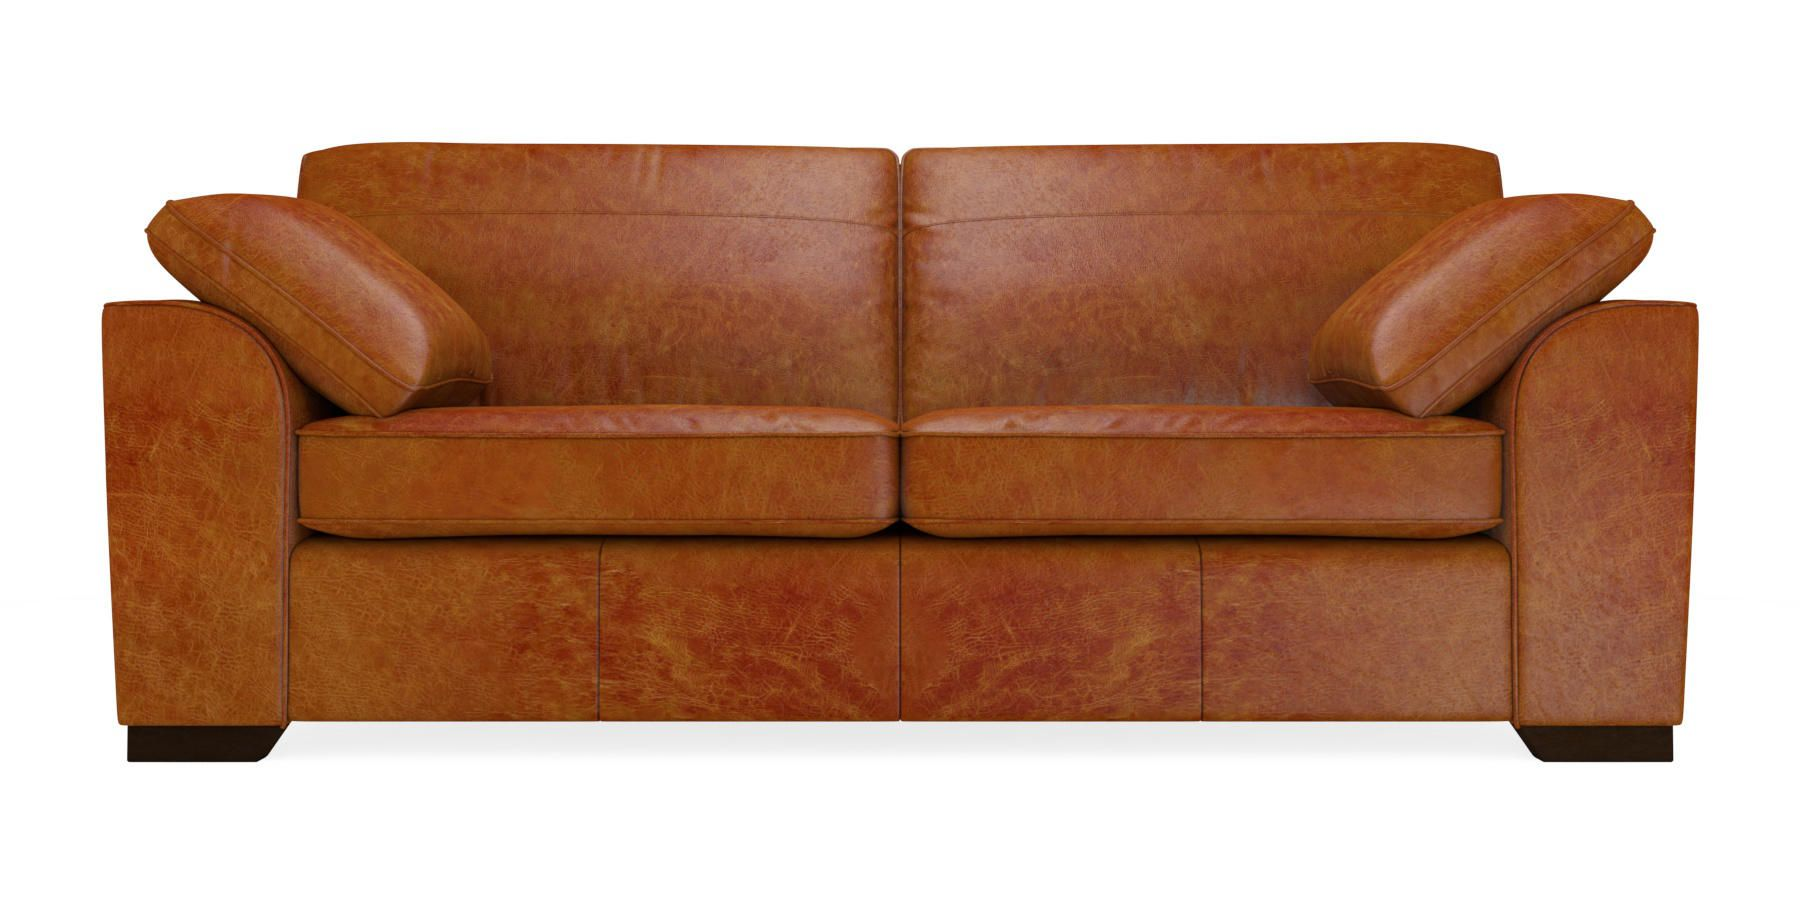 Astonishing Buy Stamford Leather Large Sofa 3 Seats Cuba Dark Tan Dark Pdpeps Interior Chair Design Pdpepsorg